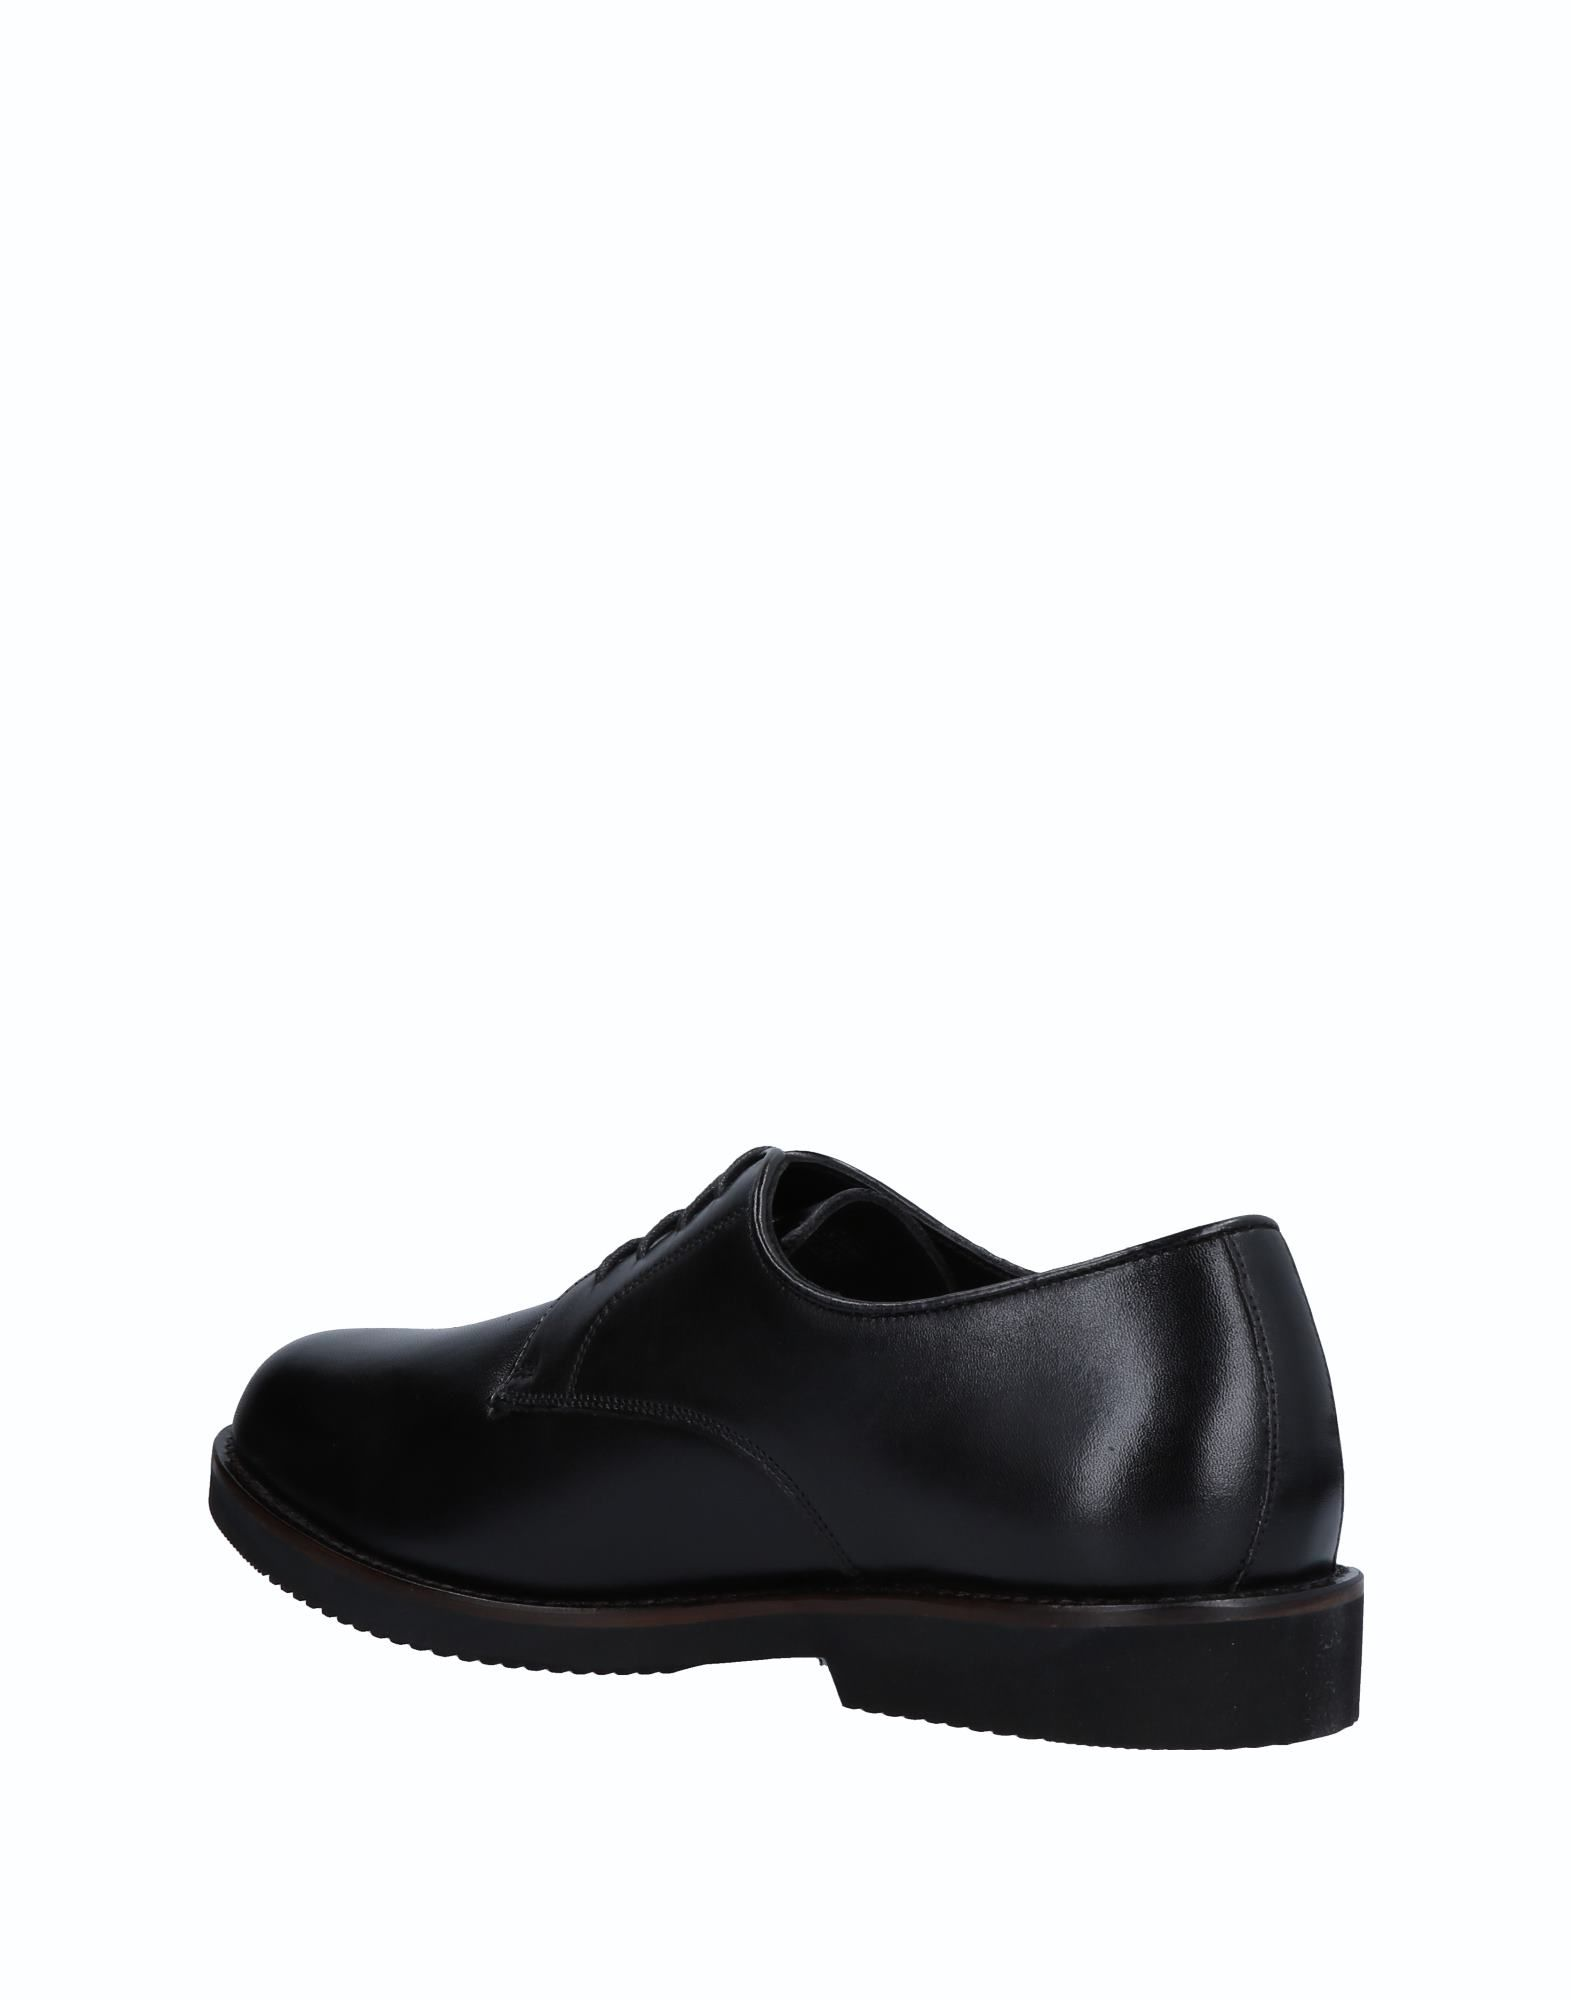 Cantarelli Heiße Schnürschuhe Herren  11514044VQ Heiße Cantarelli Schuhe c8fc28